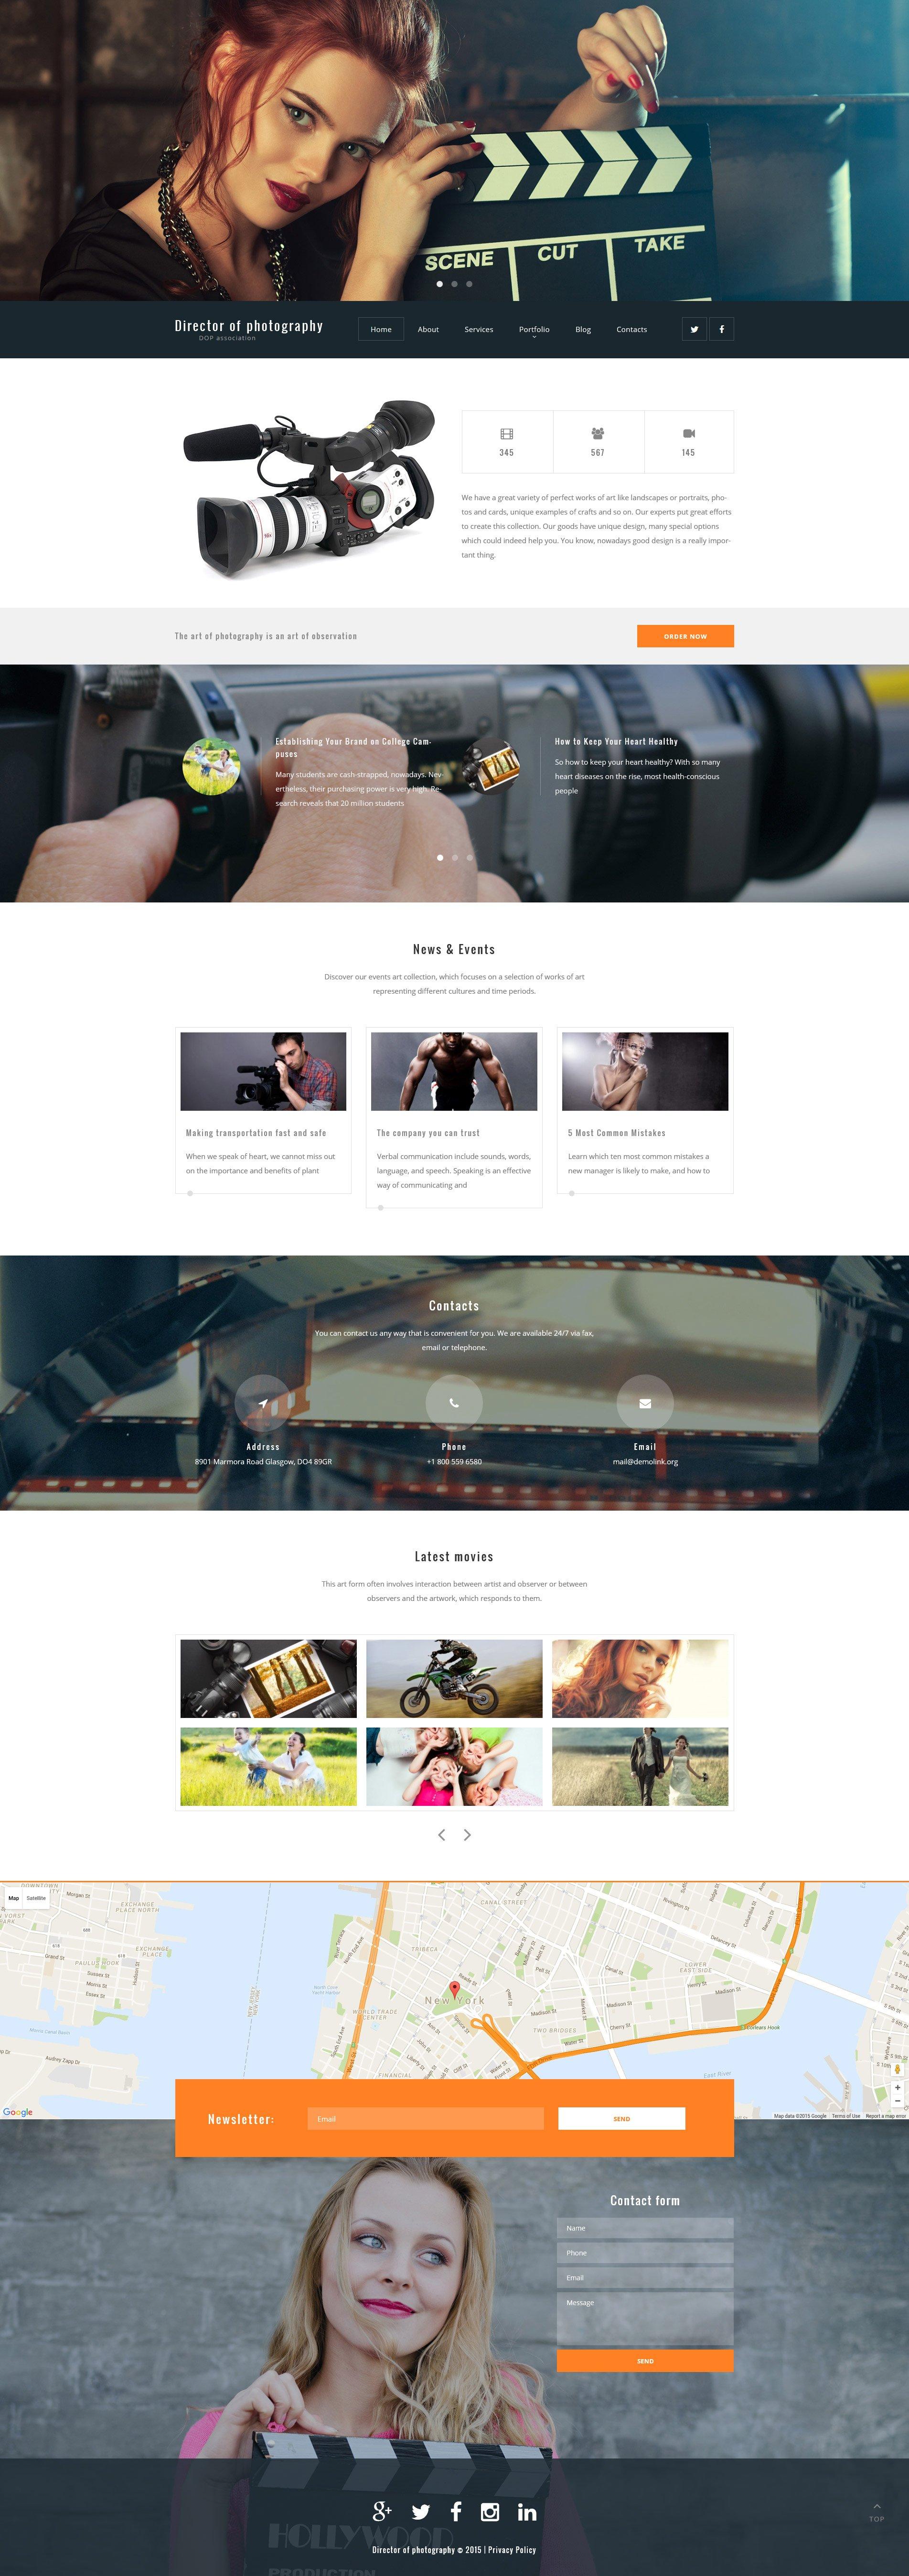 Director of Photography WordPress Theme - screenshot